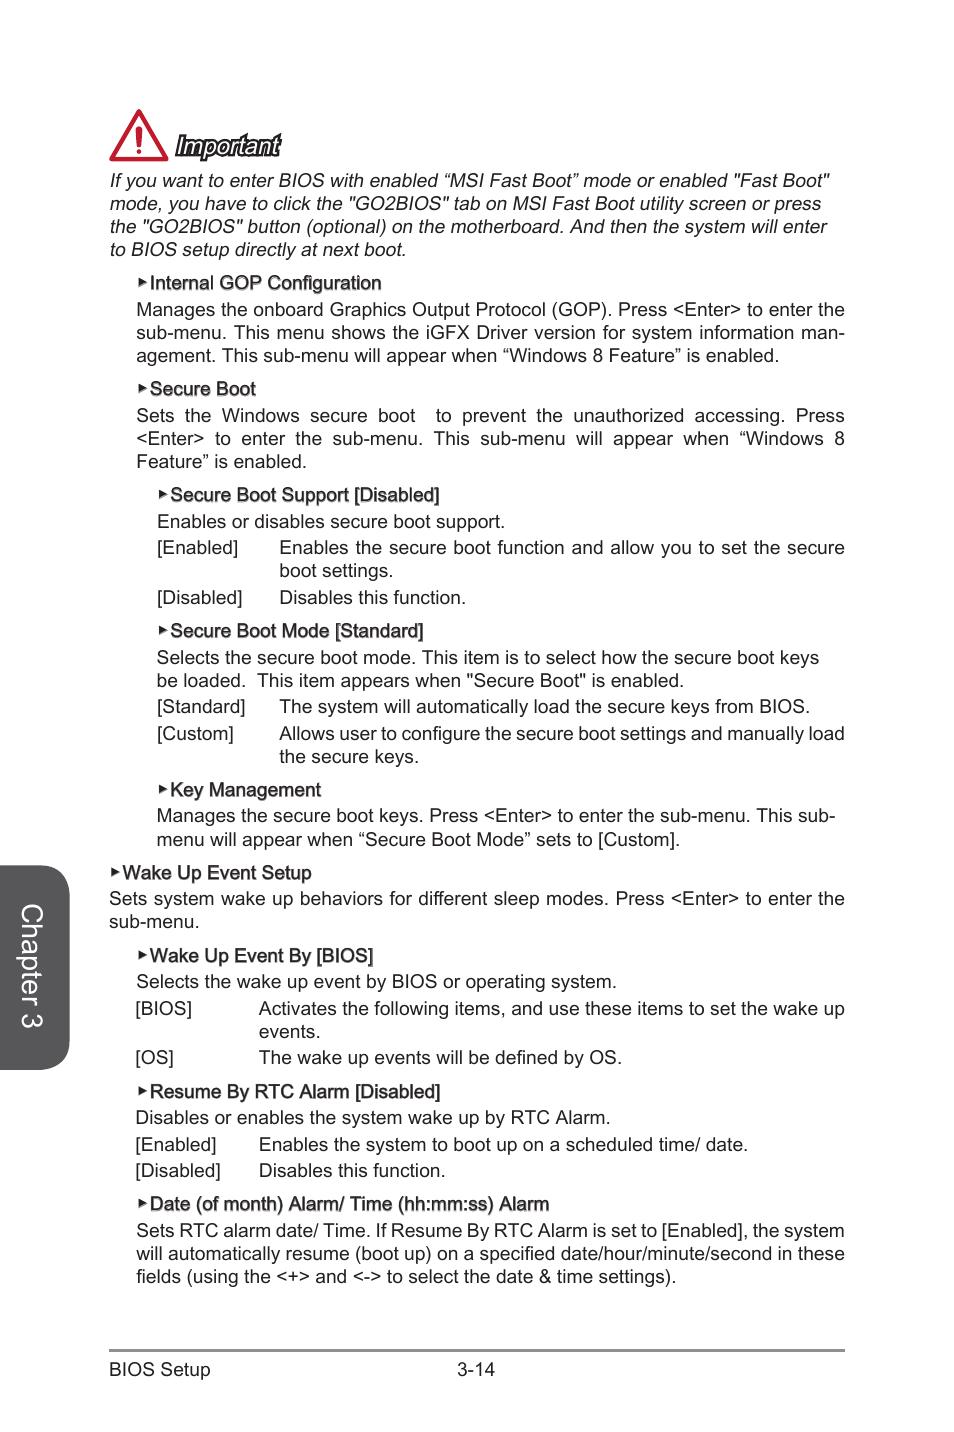 Bios resume by rtsalarm